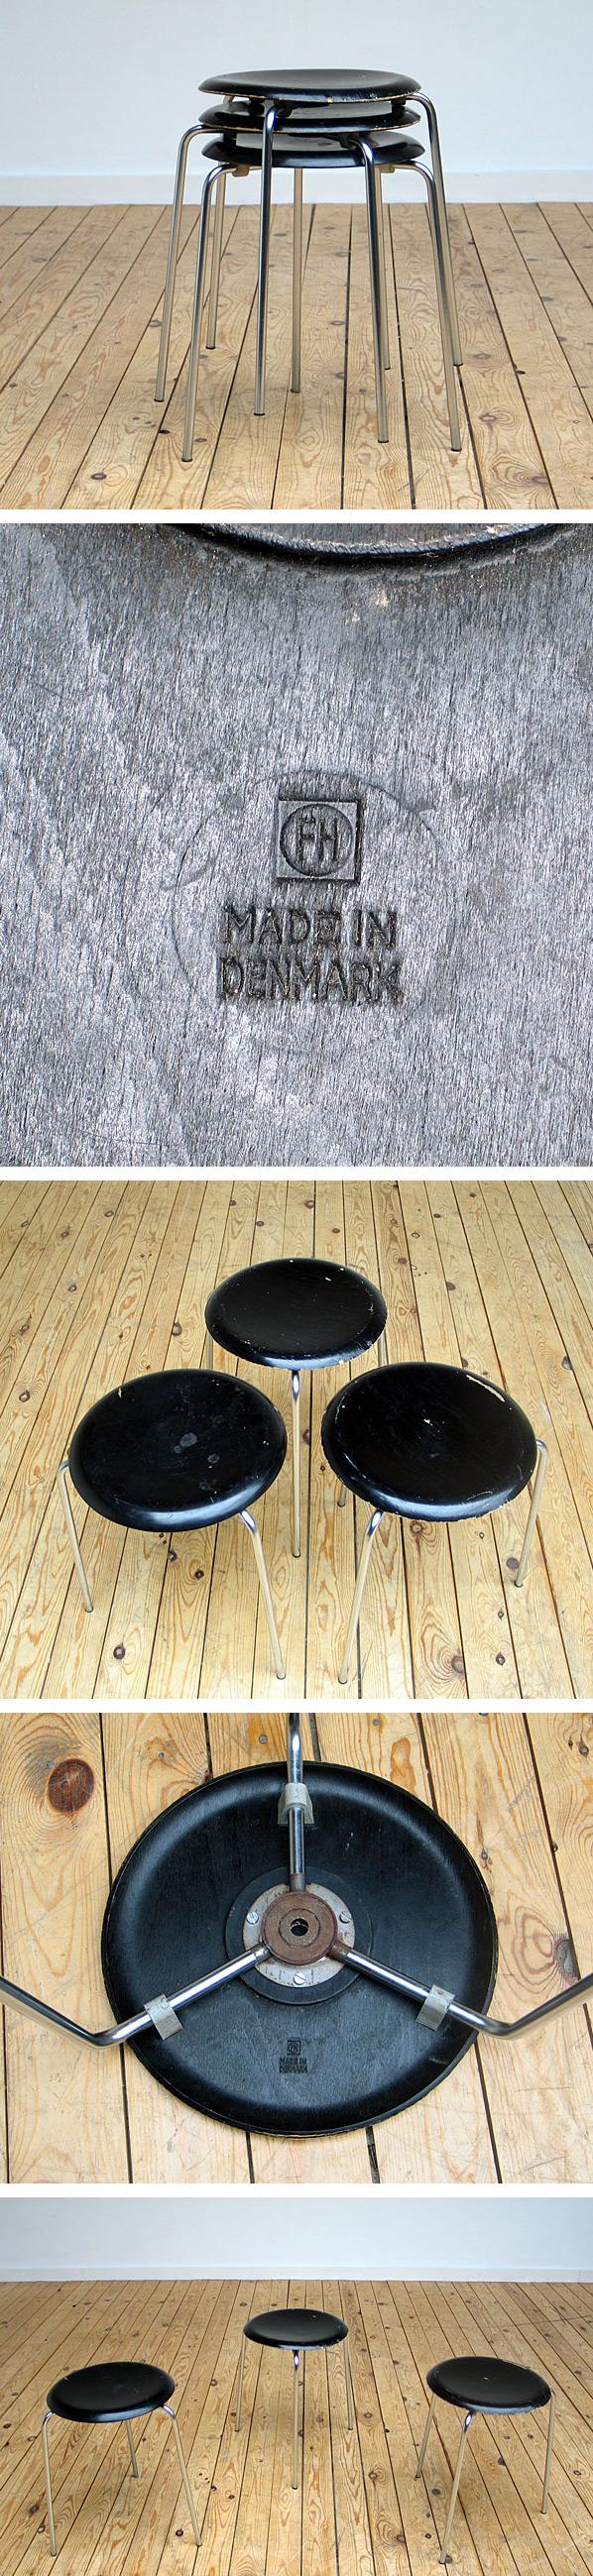 Fritz Hansen stacking stools 1963 model no. 3170 Large